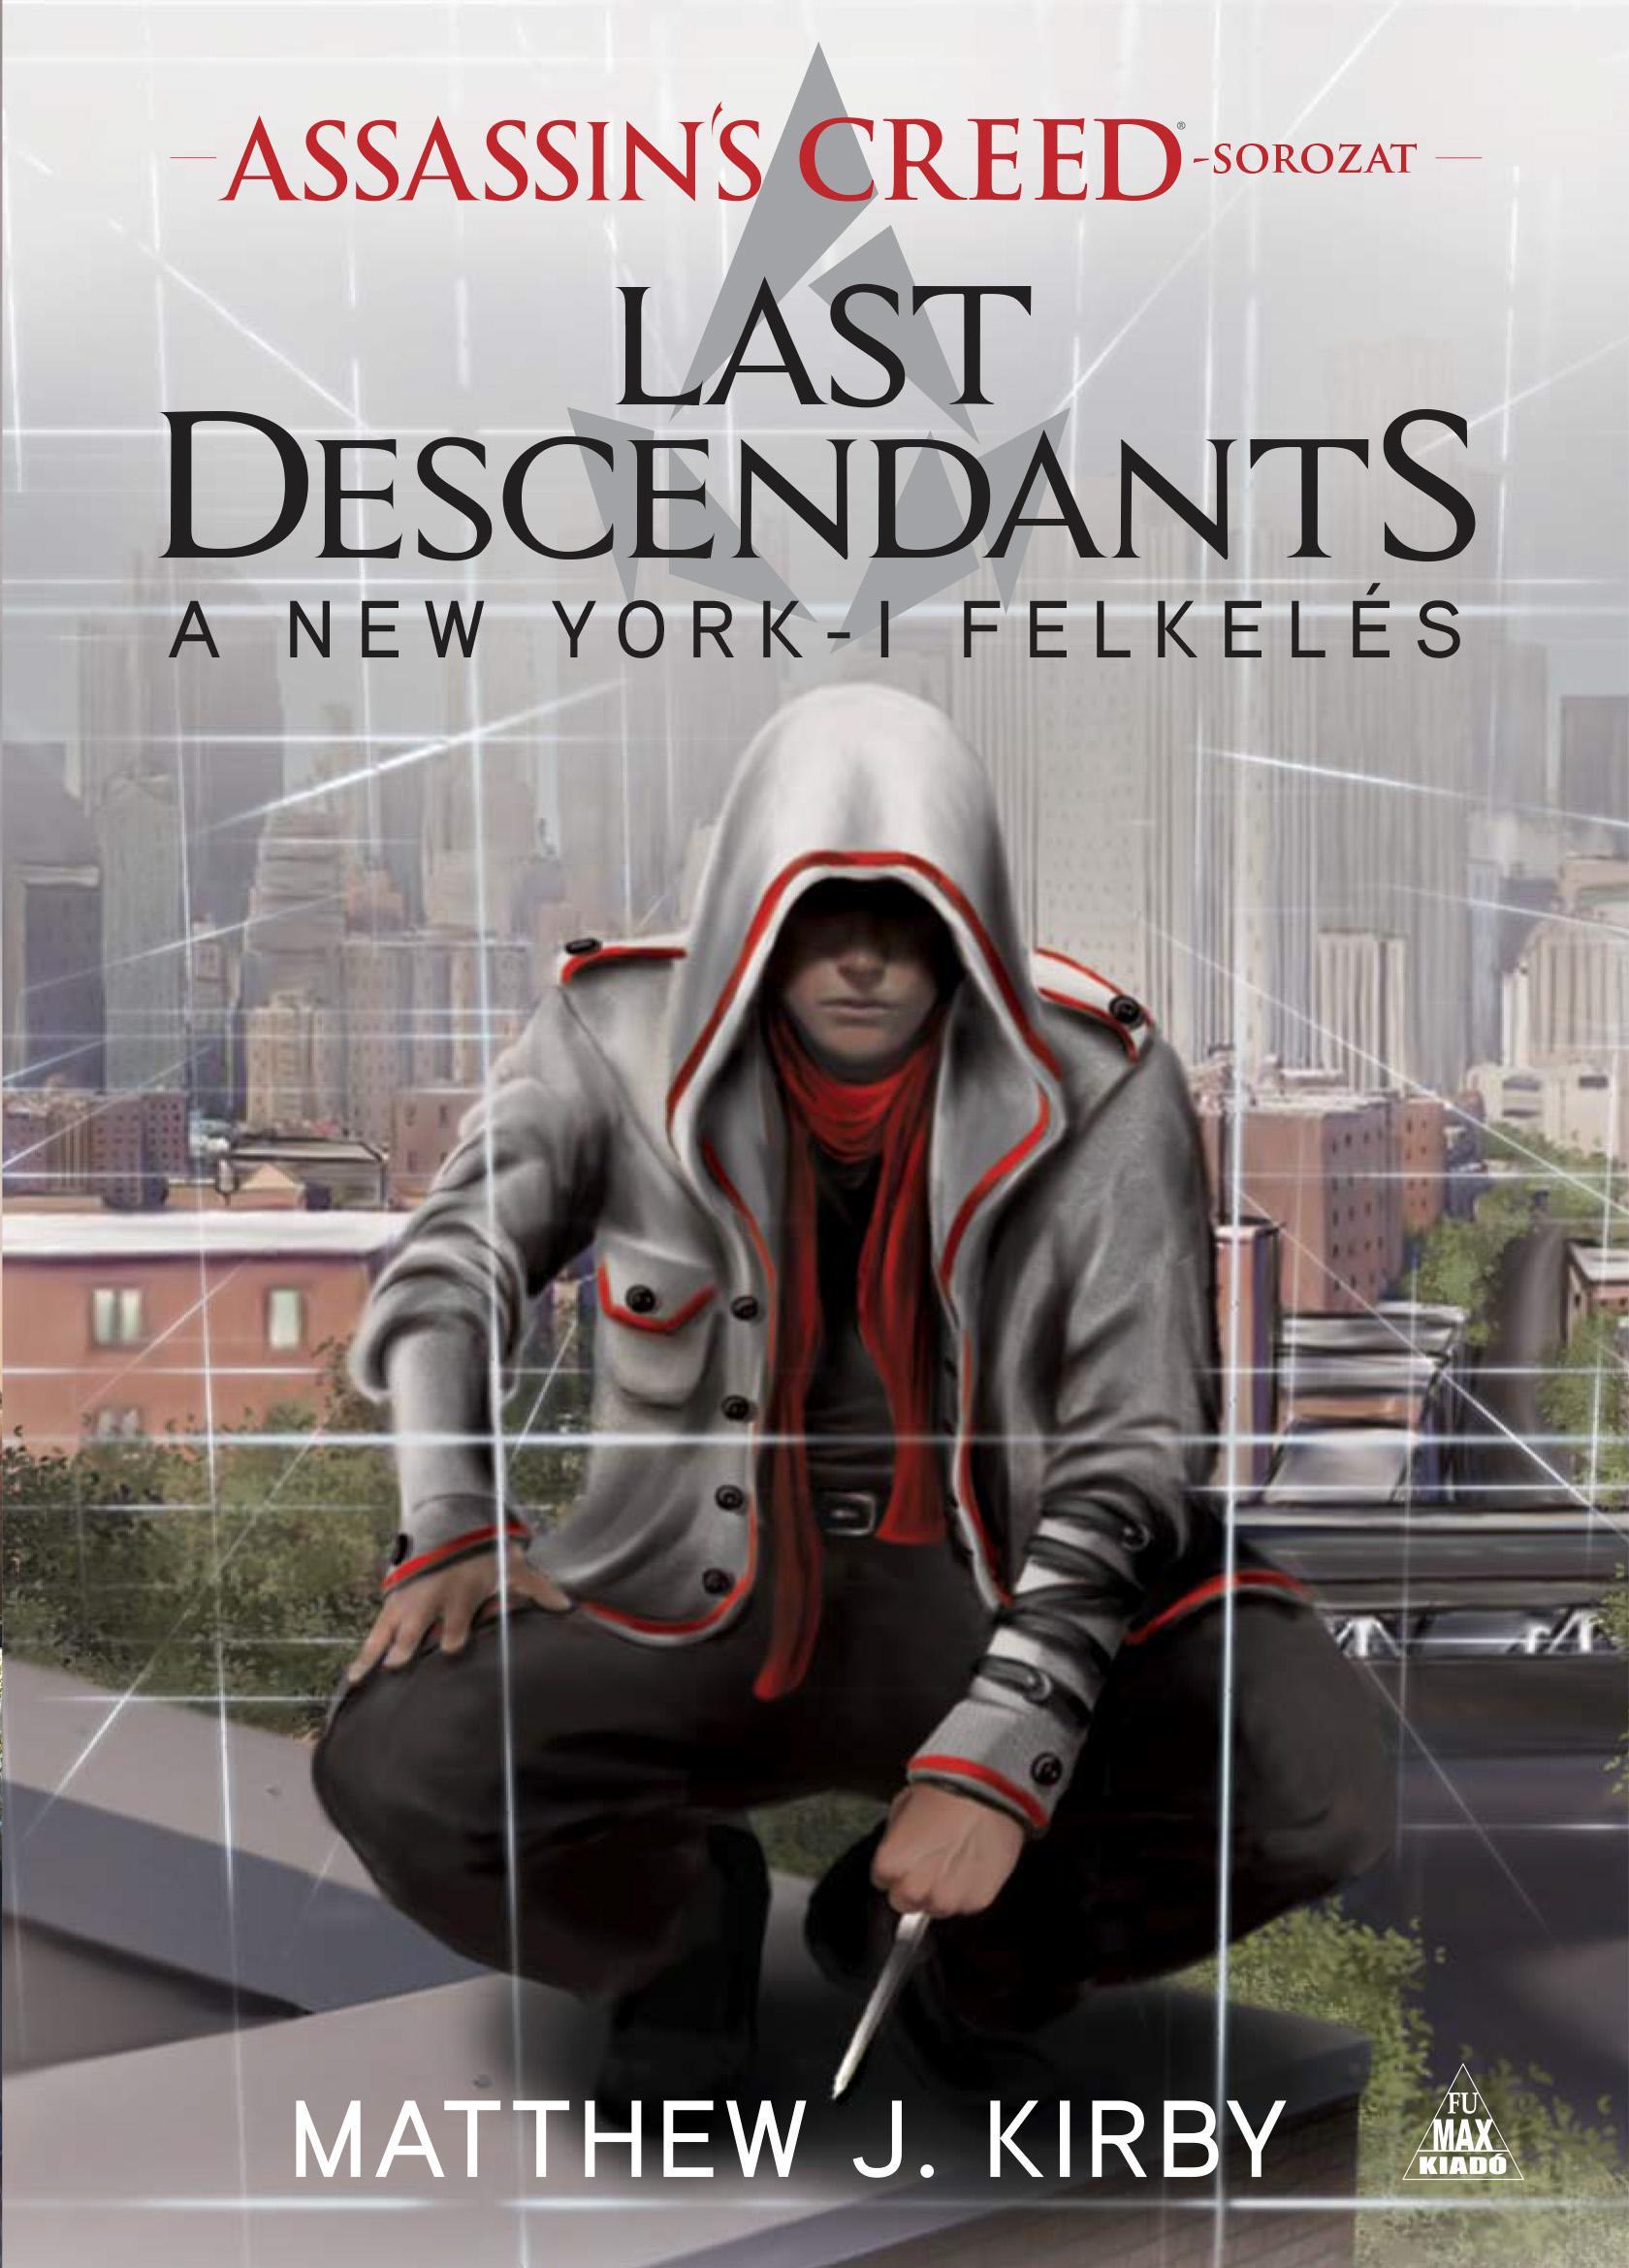 ASSASSIN'S CREED - LAST DESCENDANTS - A NEW YORK-I FELKELÉS